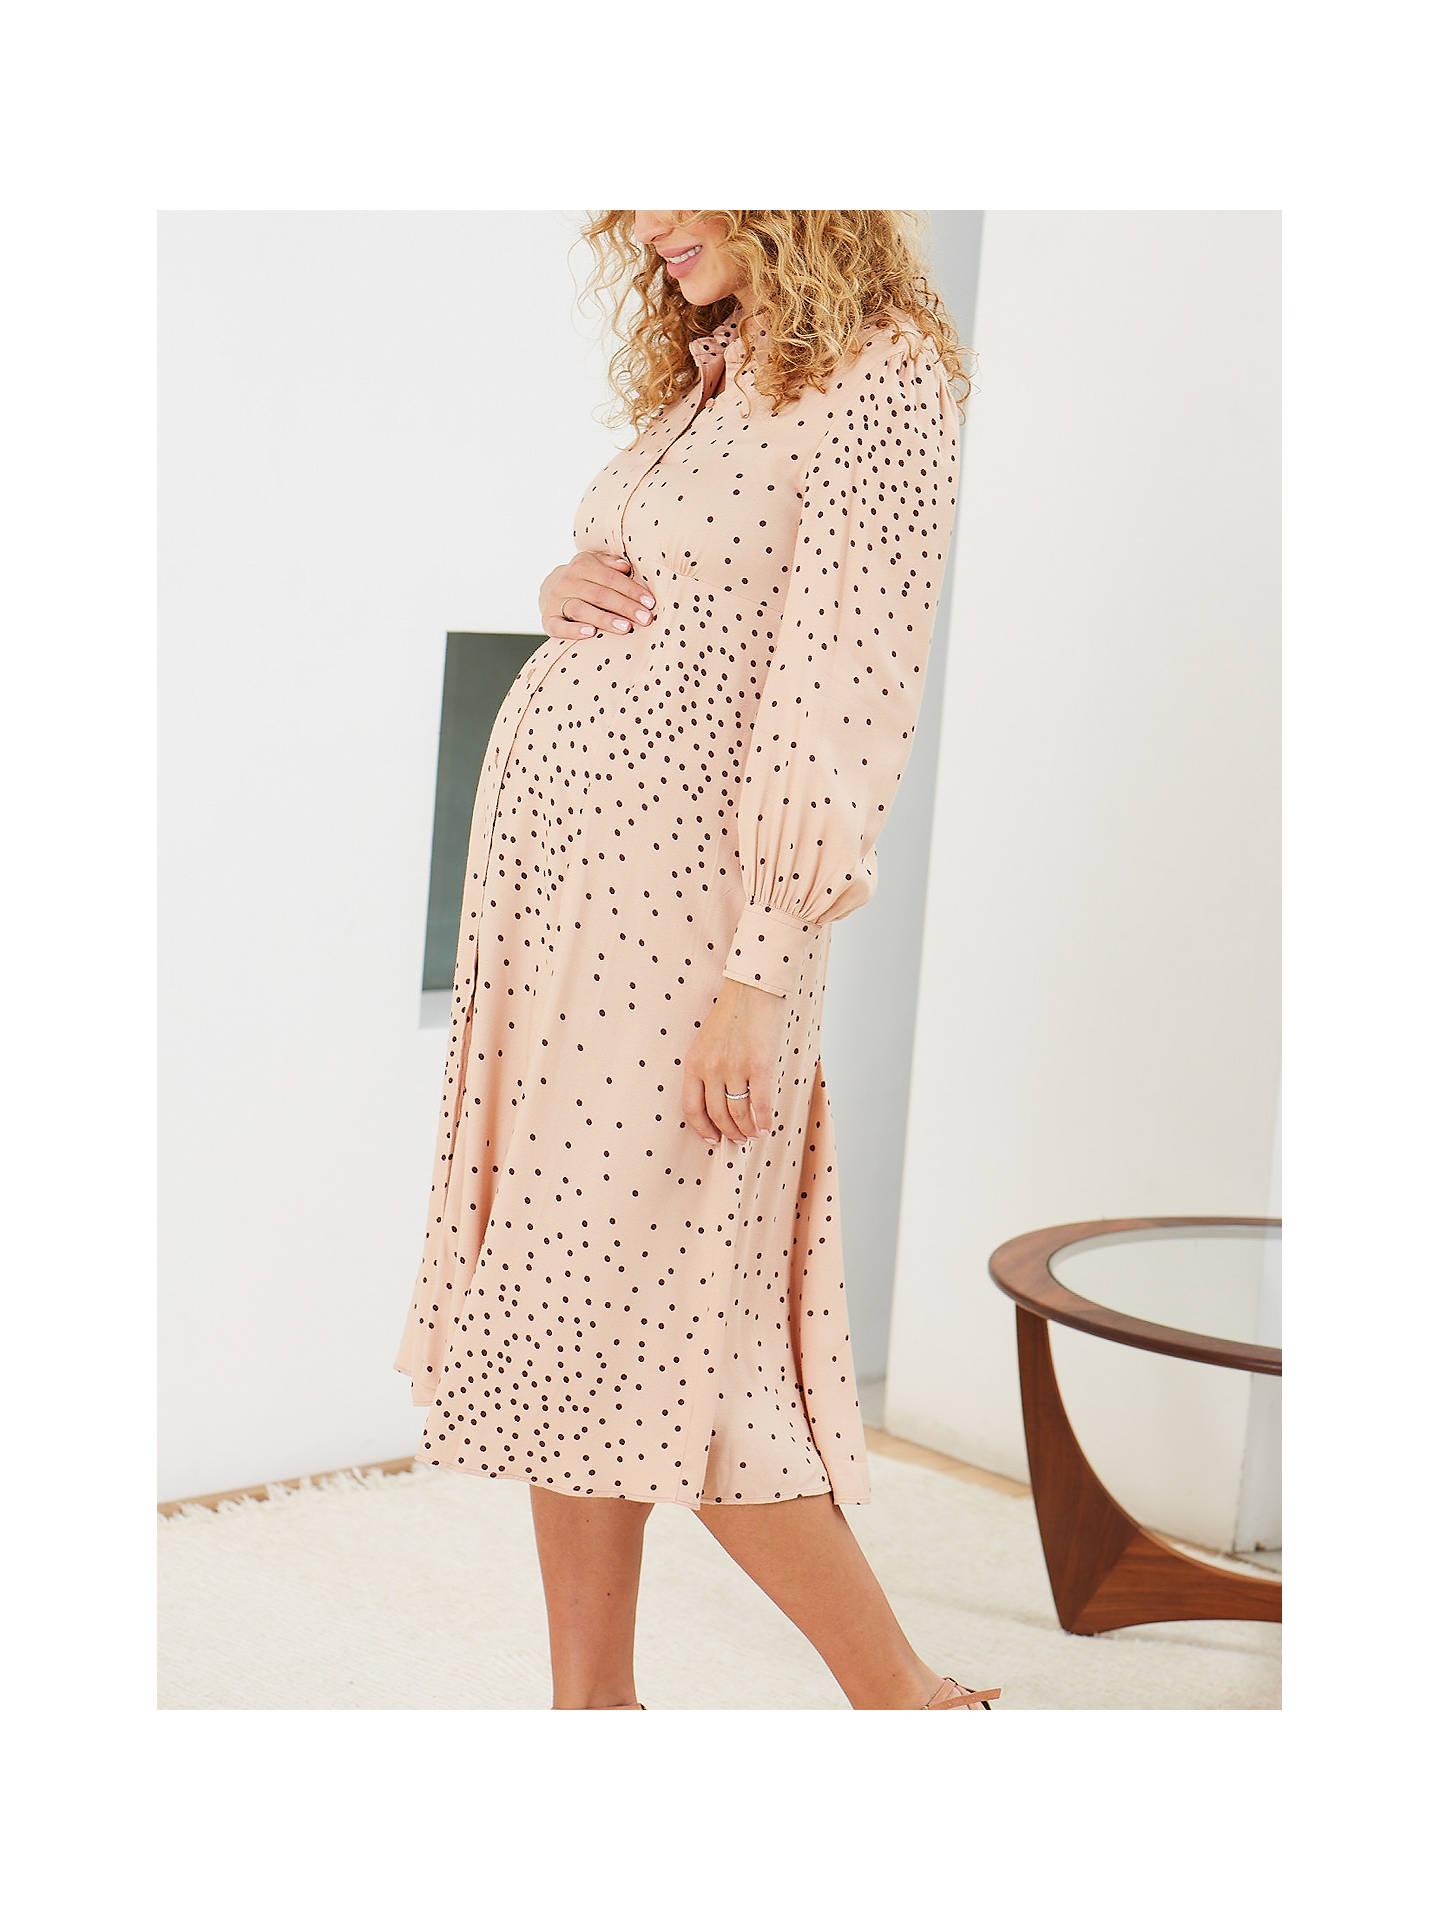 Isabella Oliver Juniper Maternity Dress Light Peach At John Lewis Partners